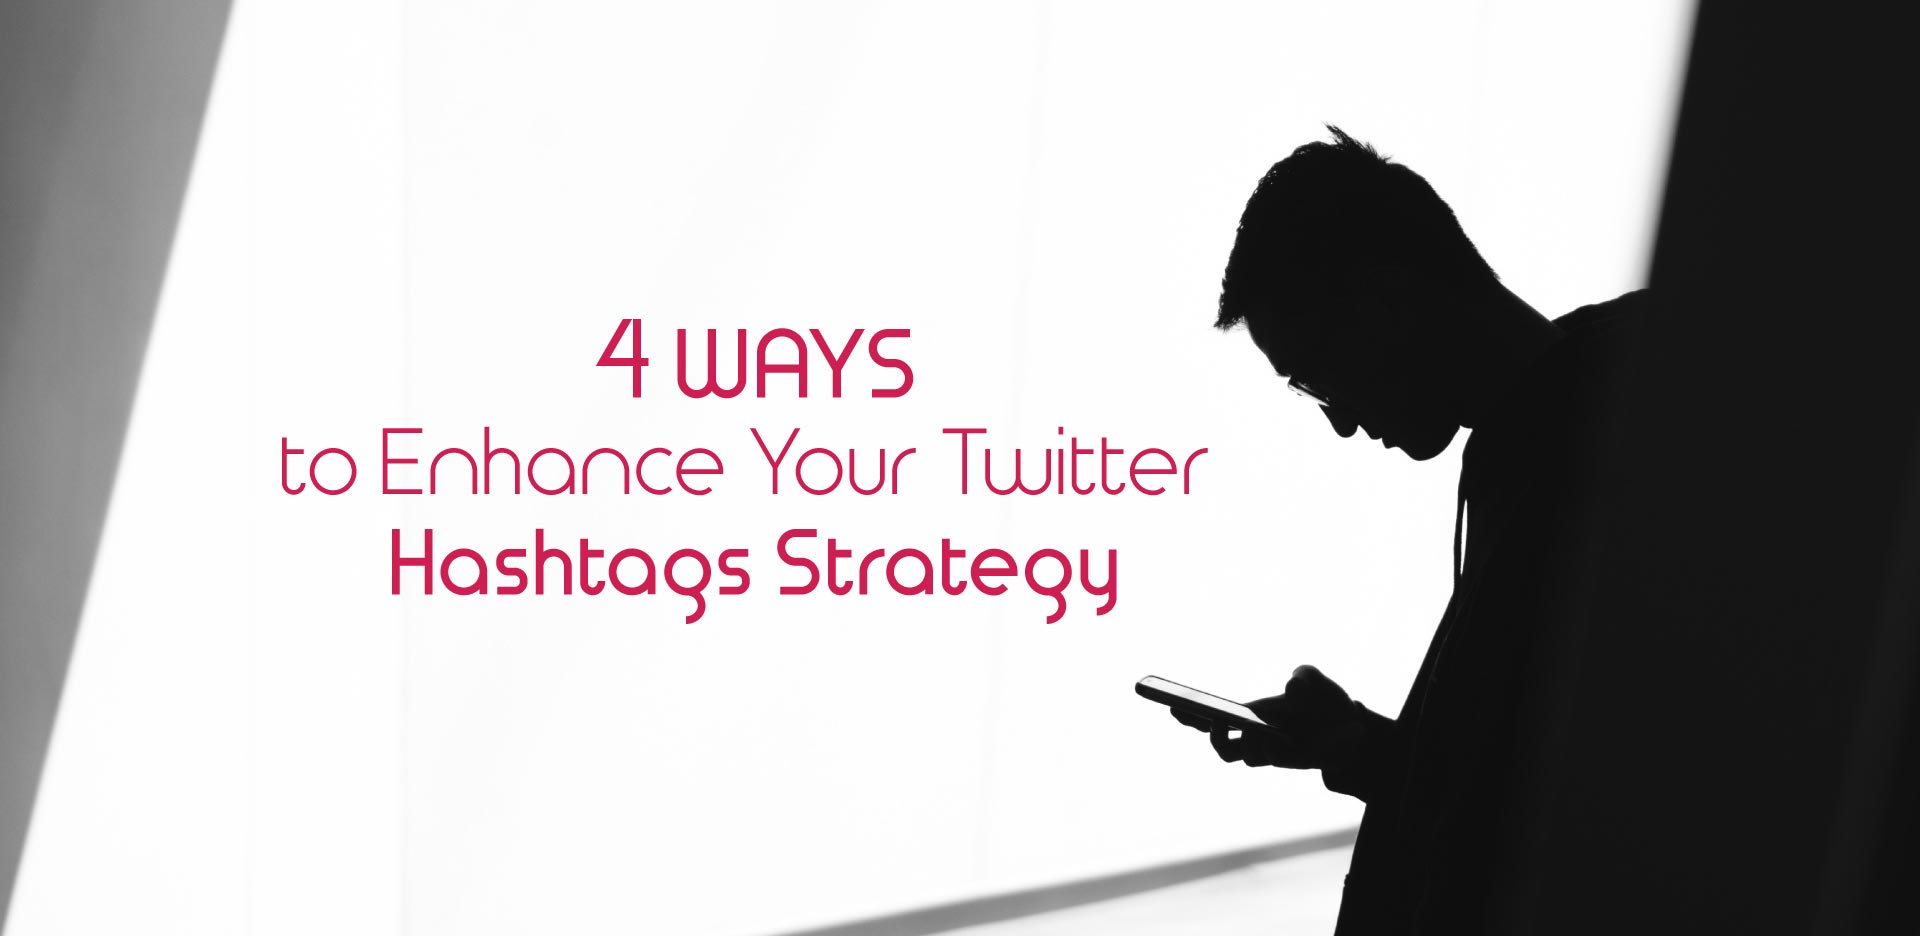 4-ways-to-enhance-twitter-hashtag-strategy